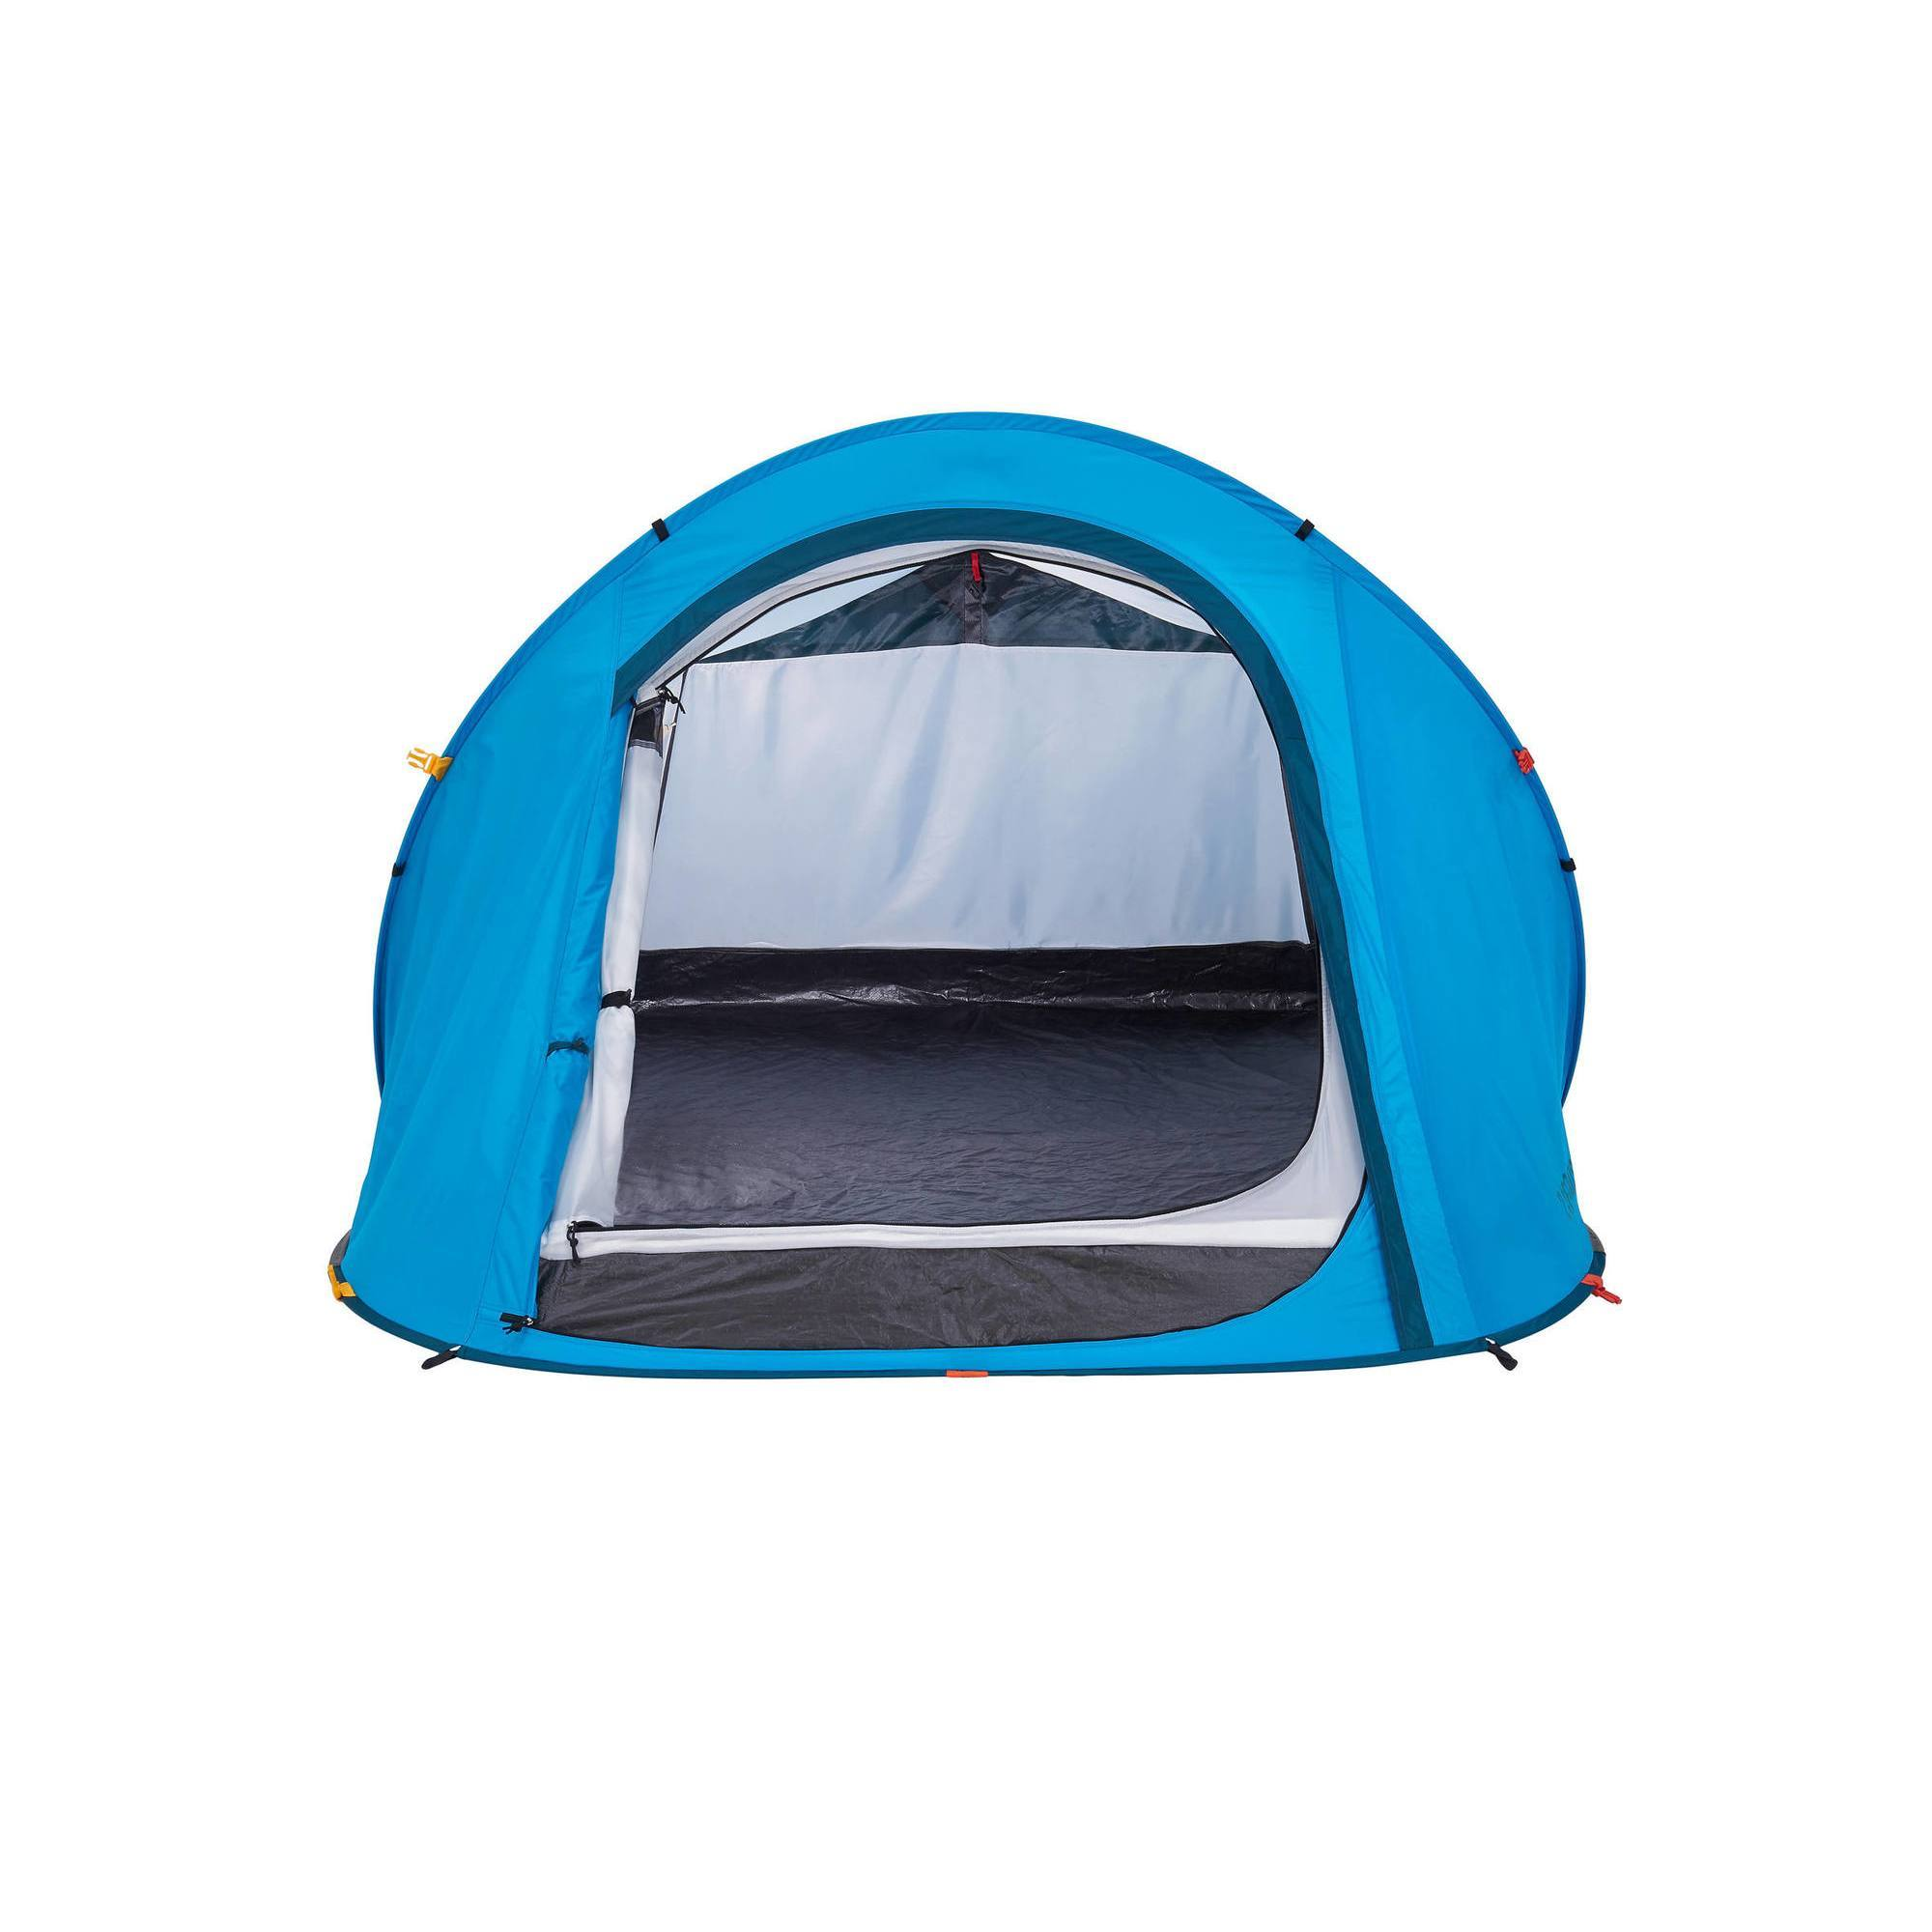 Tente de camping 2 seconds easy 2 personnes bleu